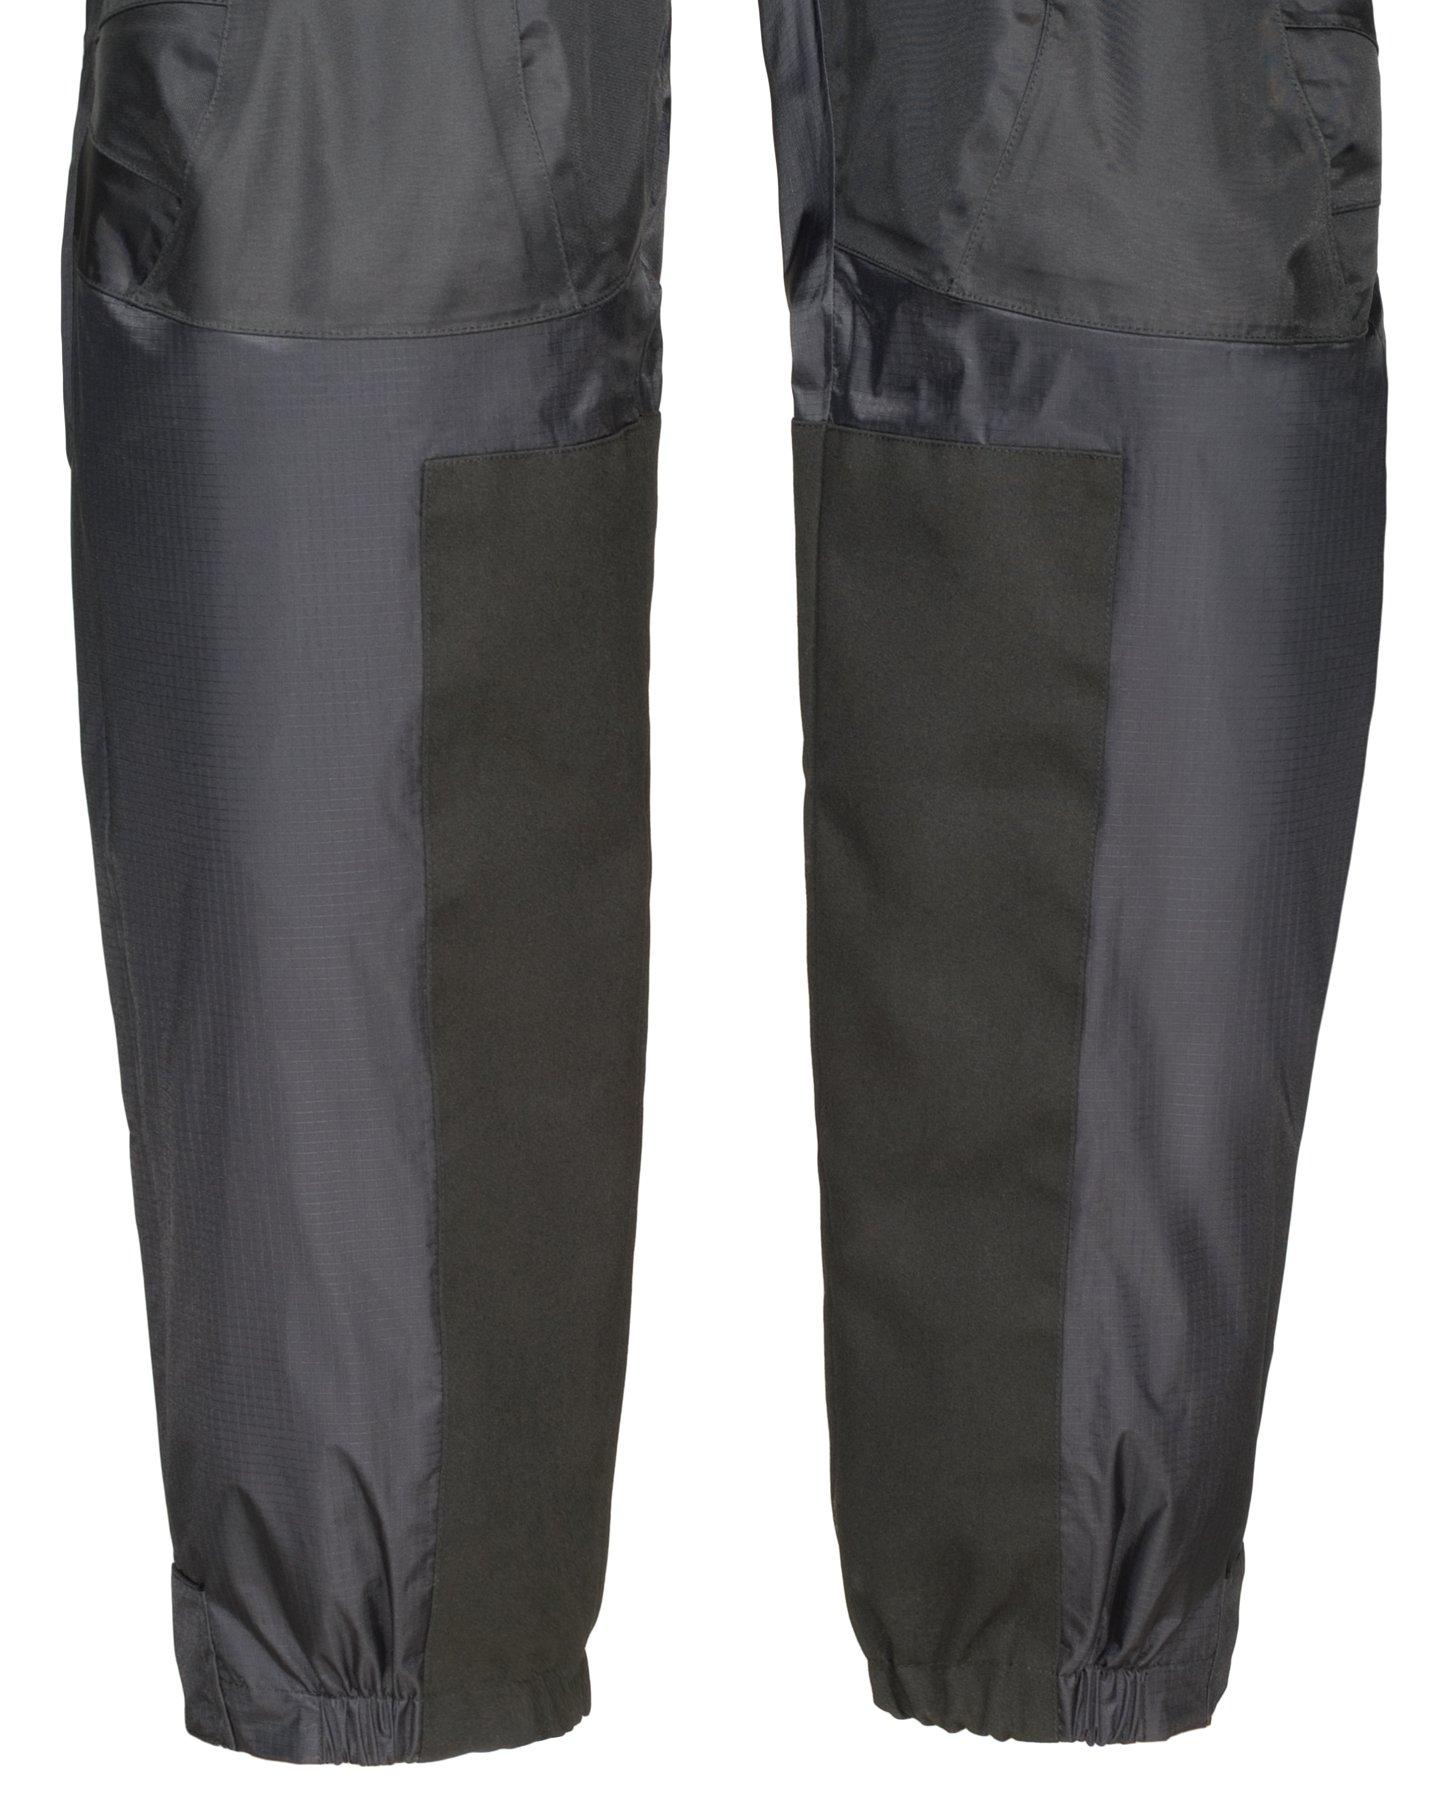 Tour Master Sentinel LE Nomex Rain Pants - Small/Black by Tourmaster (Image #3)